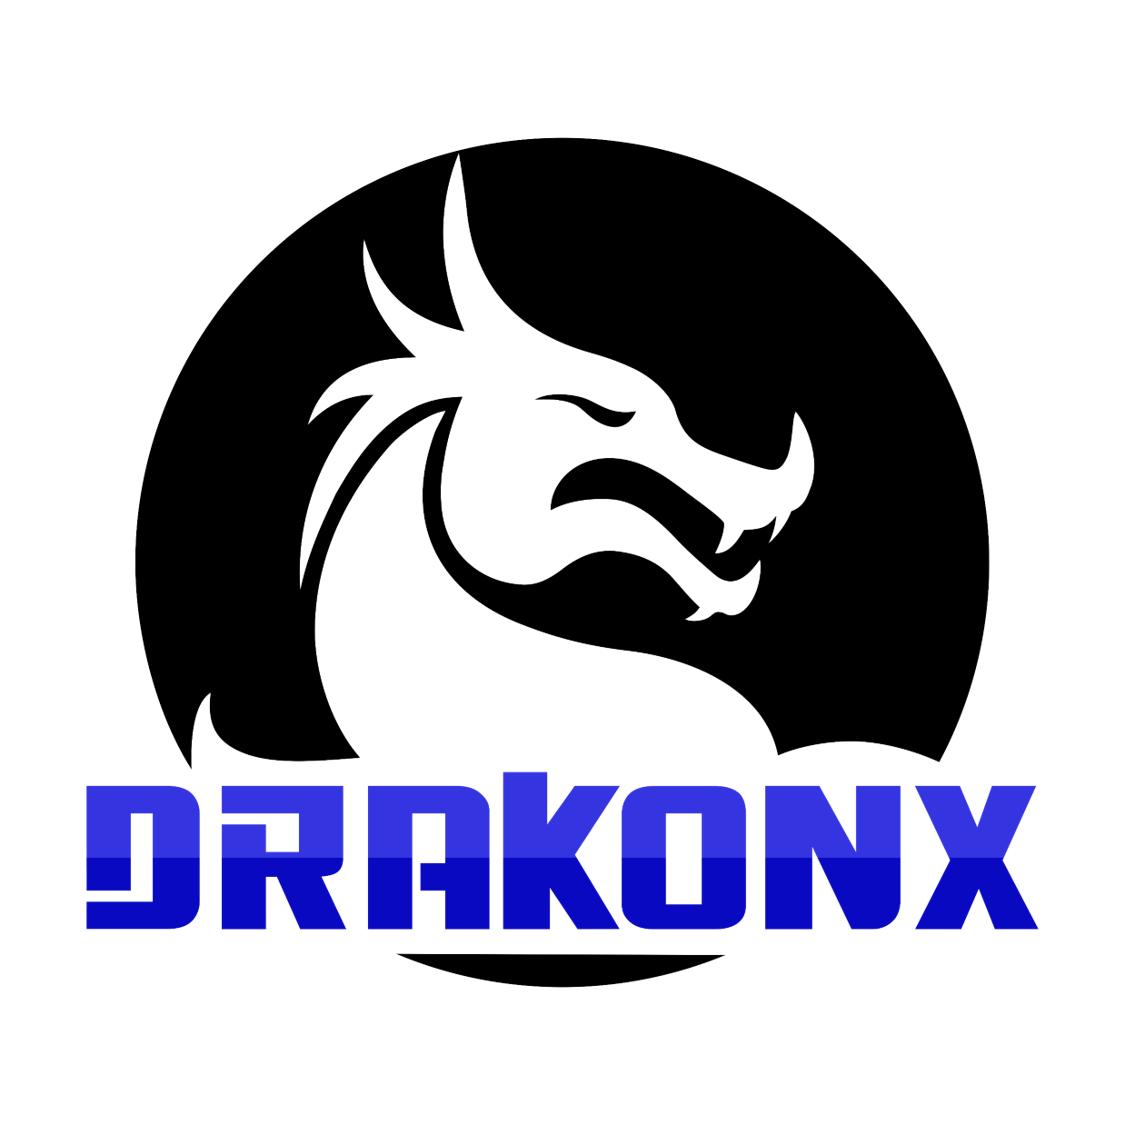 Drakonx Private Investigator Detective